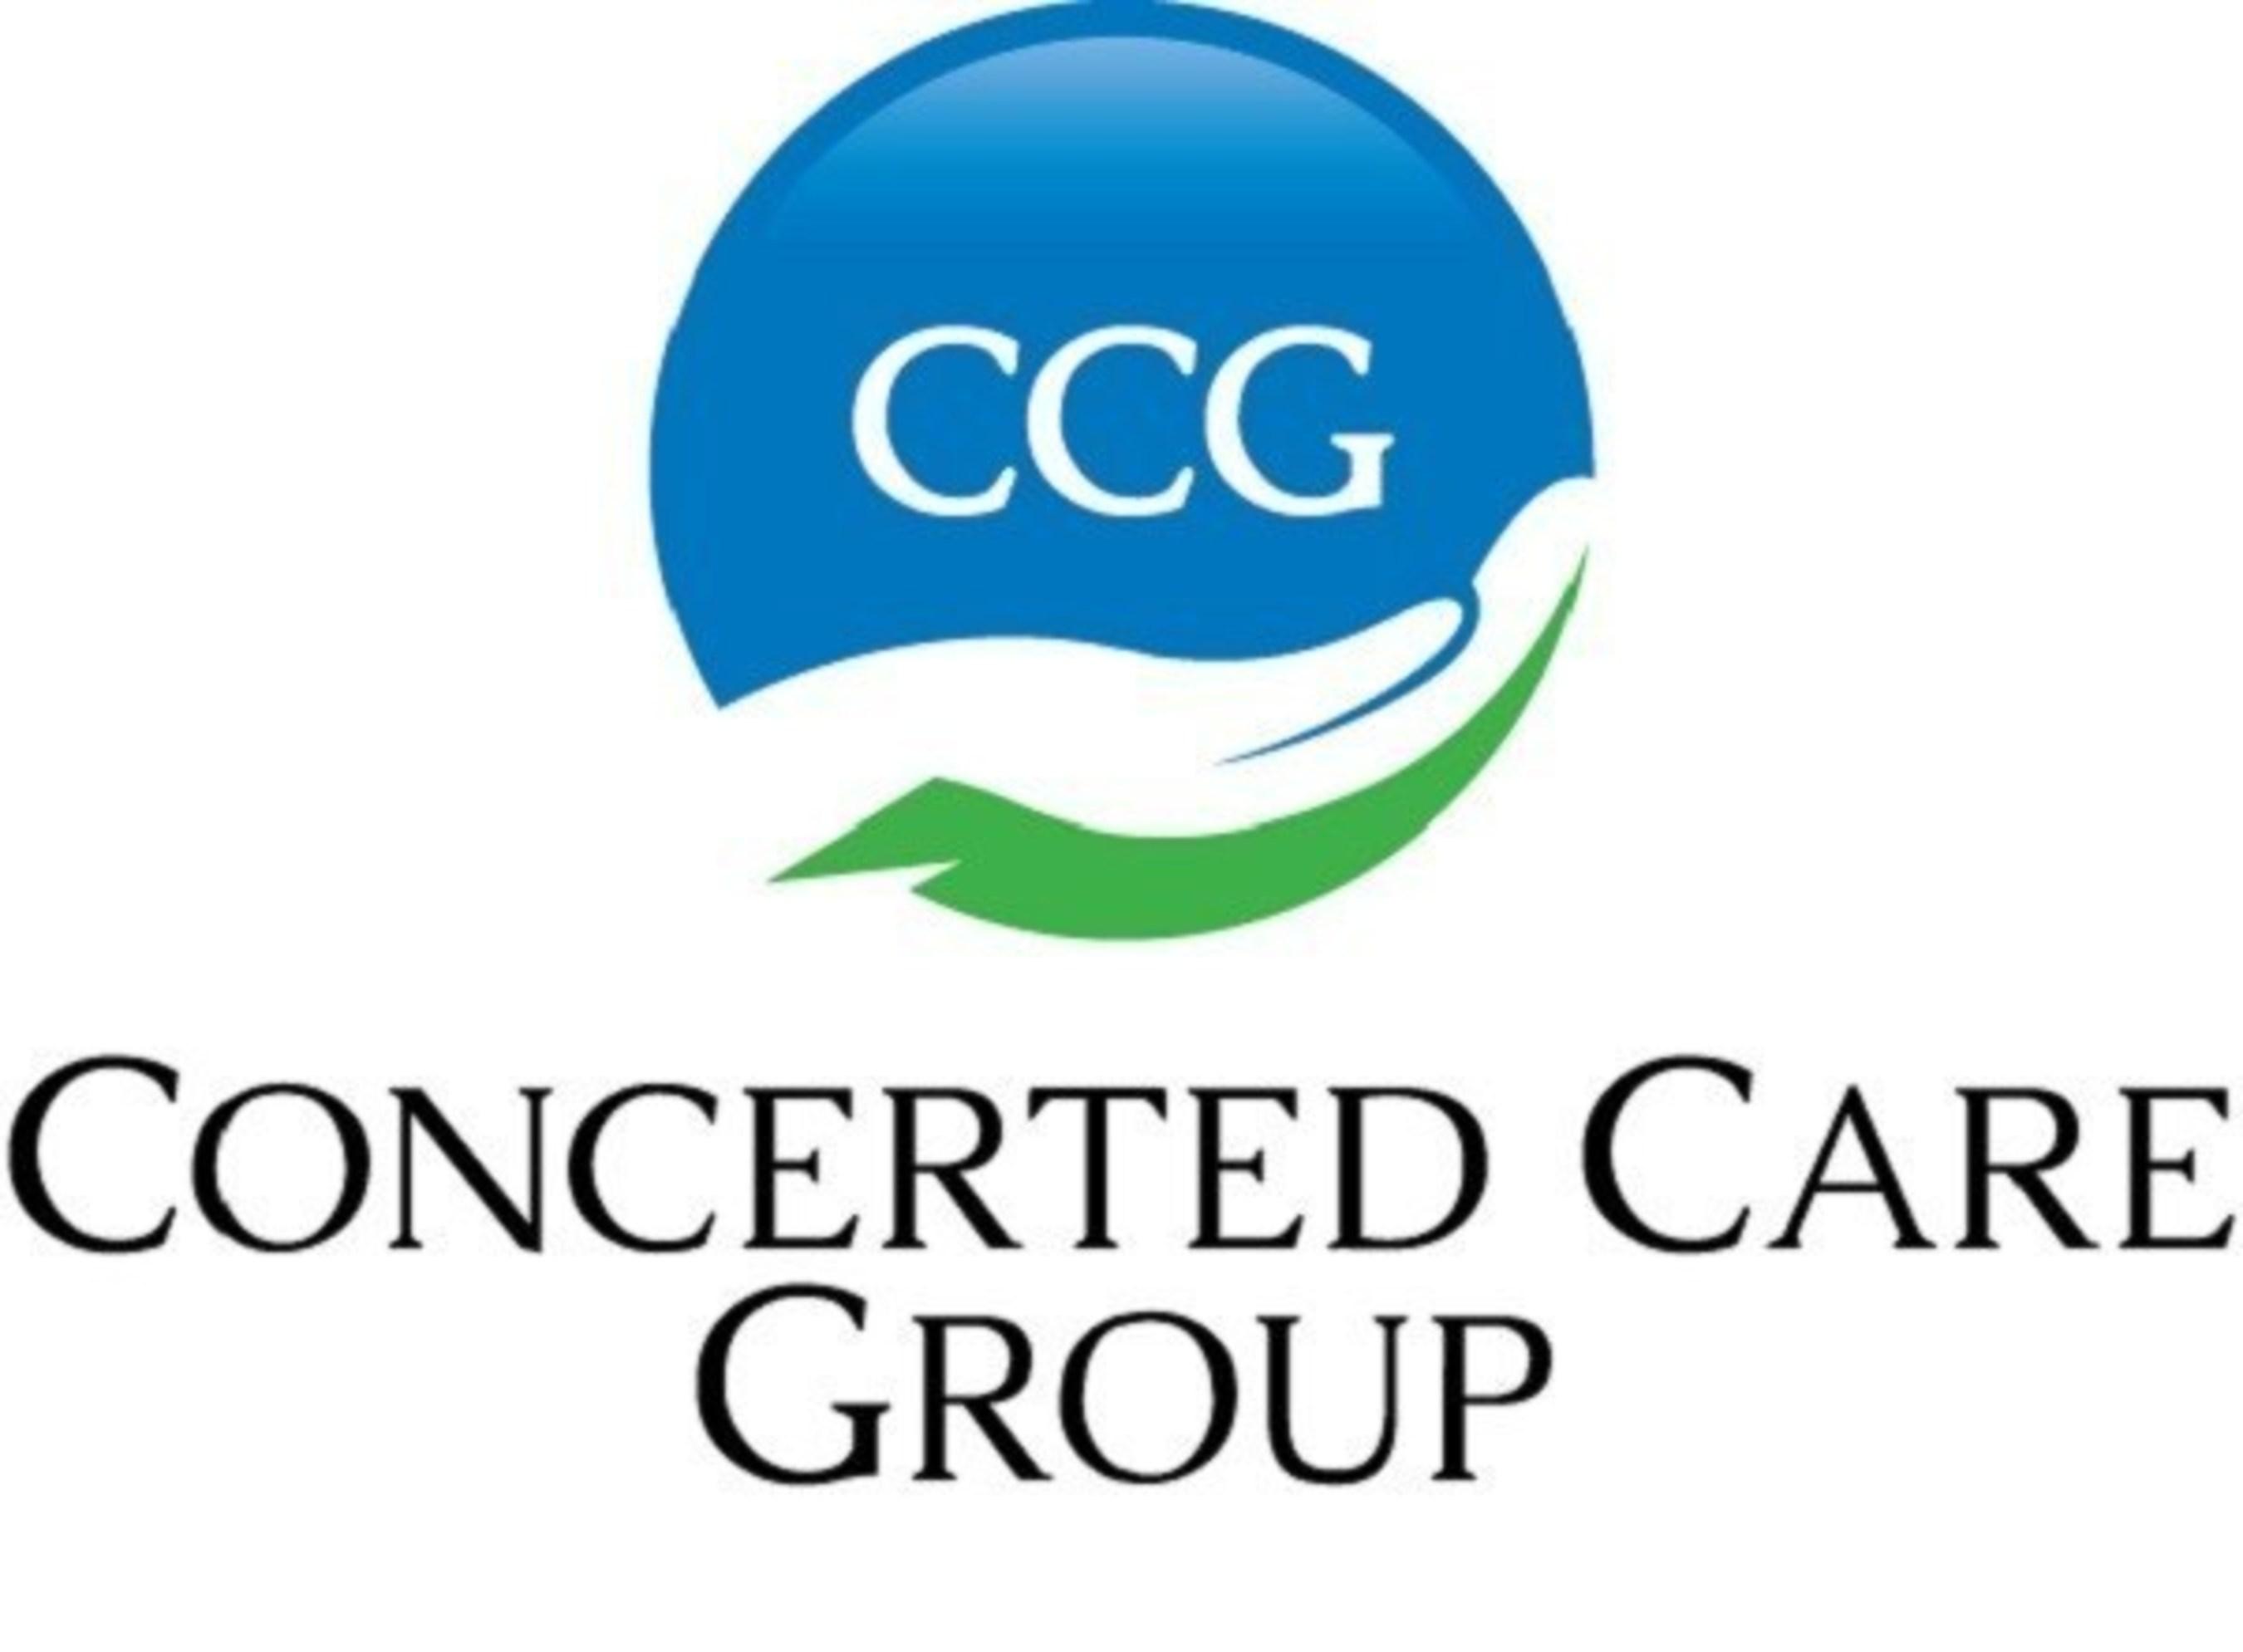 Concerted Care Group logo (PRNewsFoto/Concerted Care Group)